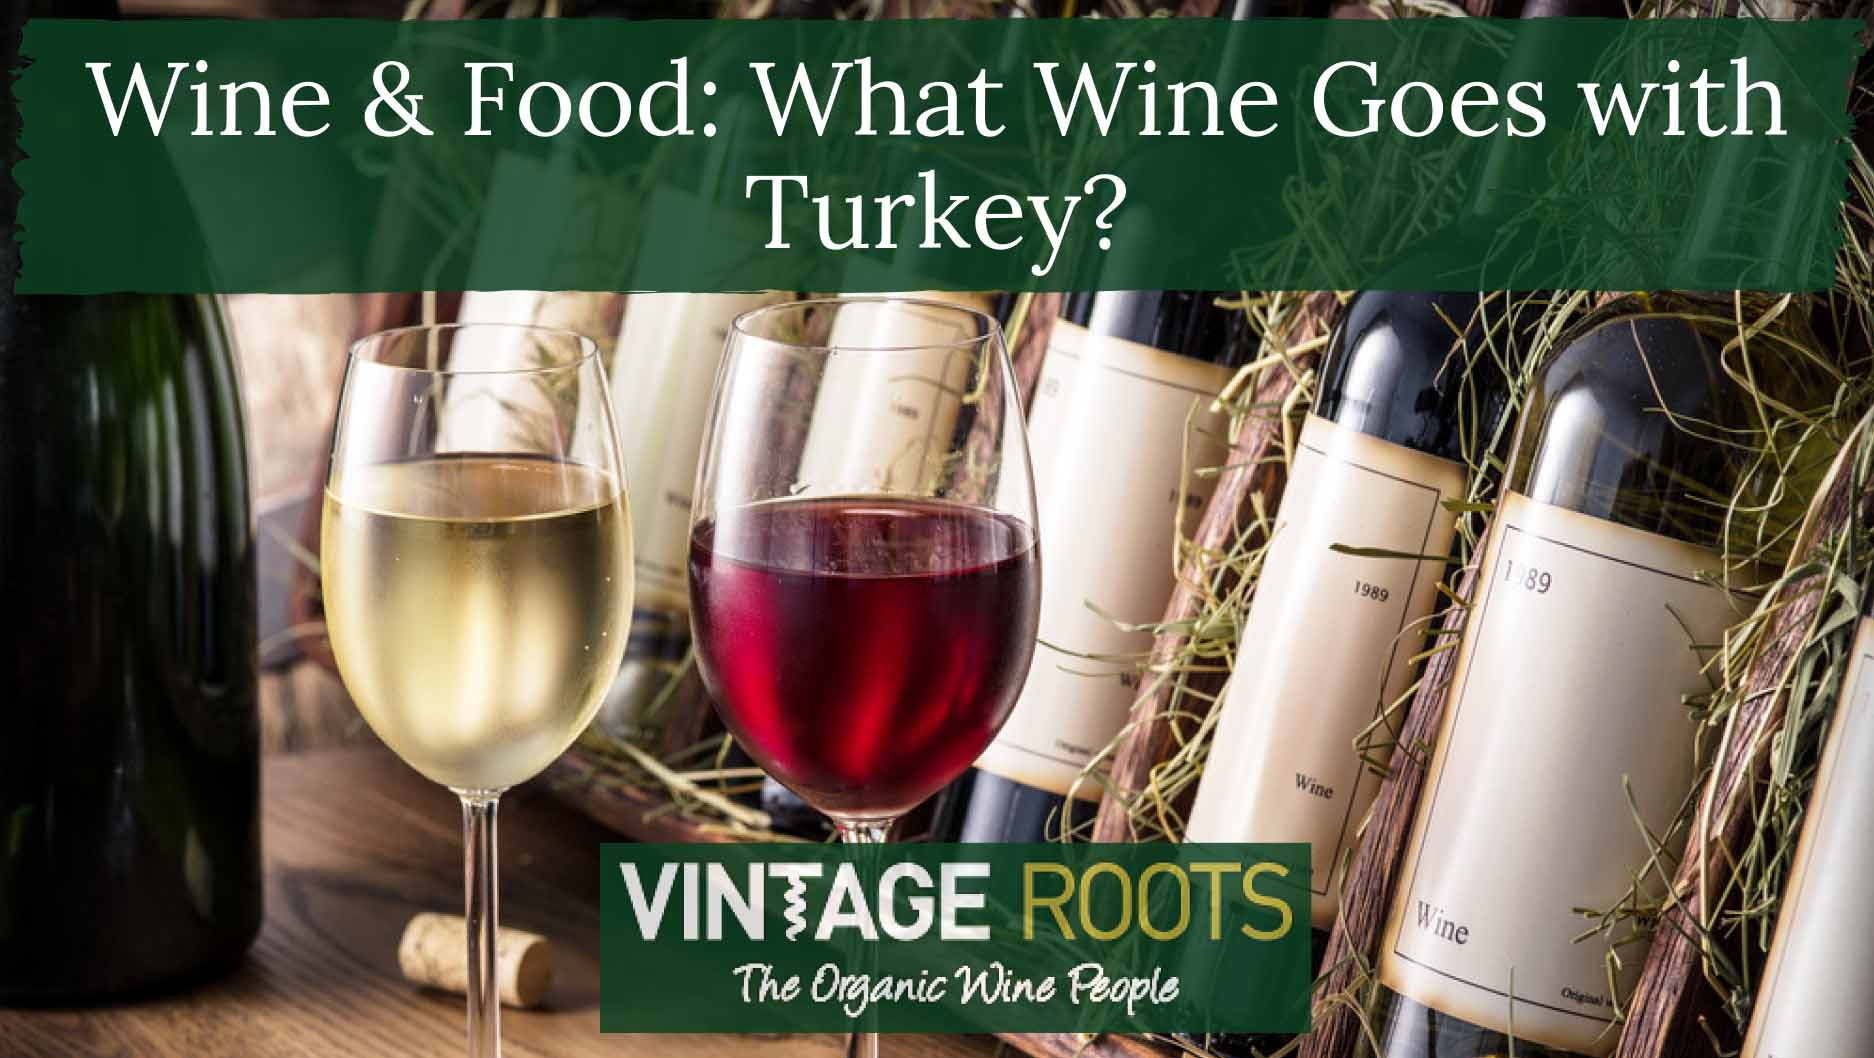 Wine Food What Wine Goes With Turkey Vintage Roots Organic Wine Biodynamic Wines